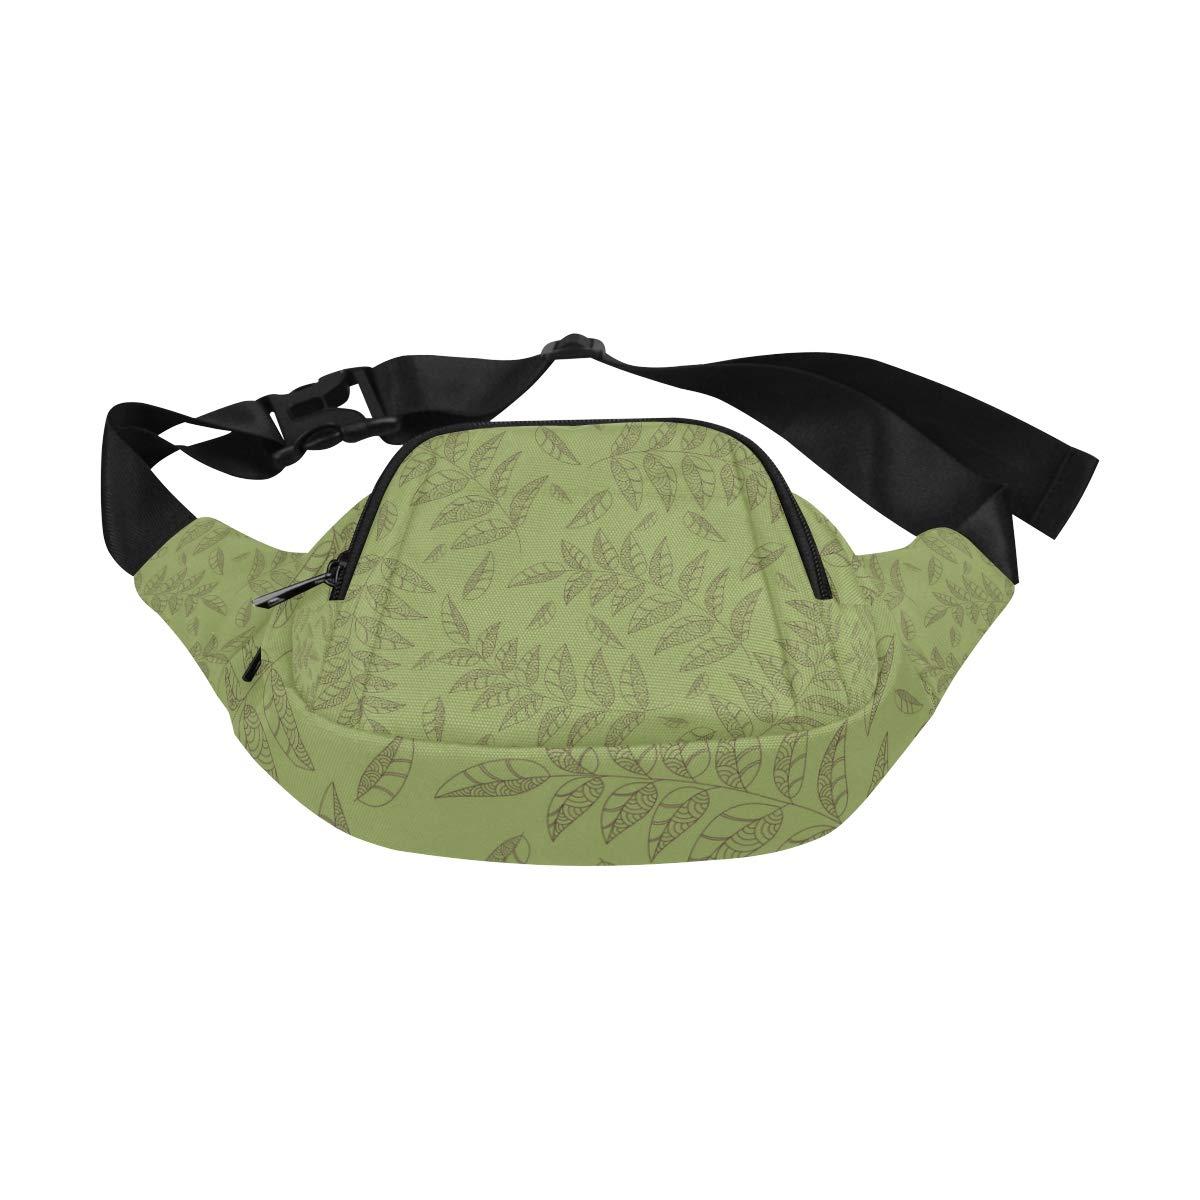 Green Willow Leaves In Spring Fenny Packs Waist Bags Adjustable Belt Waterproof Nylon Travel Running Sport Vacation Party For Men Women Boys Girls Kids